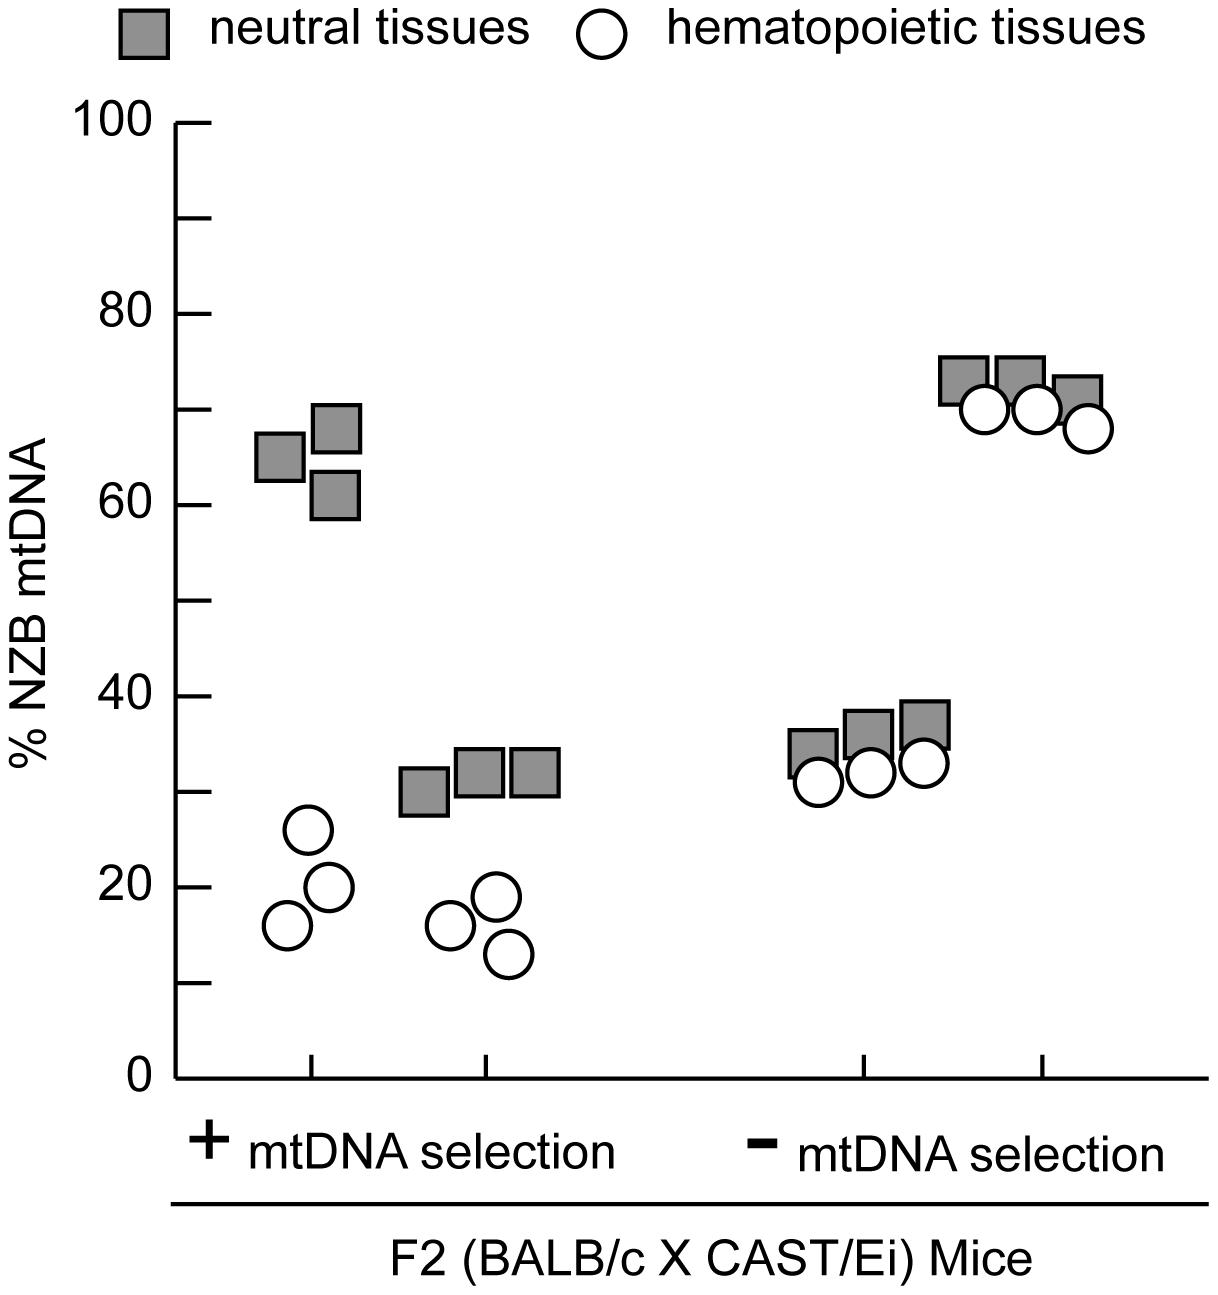 MtDNA segregation in hematopoietic tissues of 12-month-old heteroplasmic F2 (BALB/c X CAST/Ei) mice.